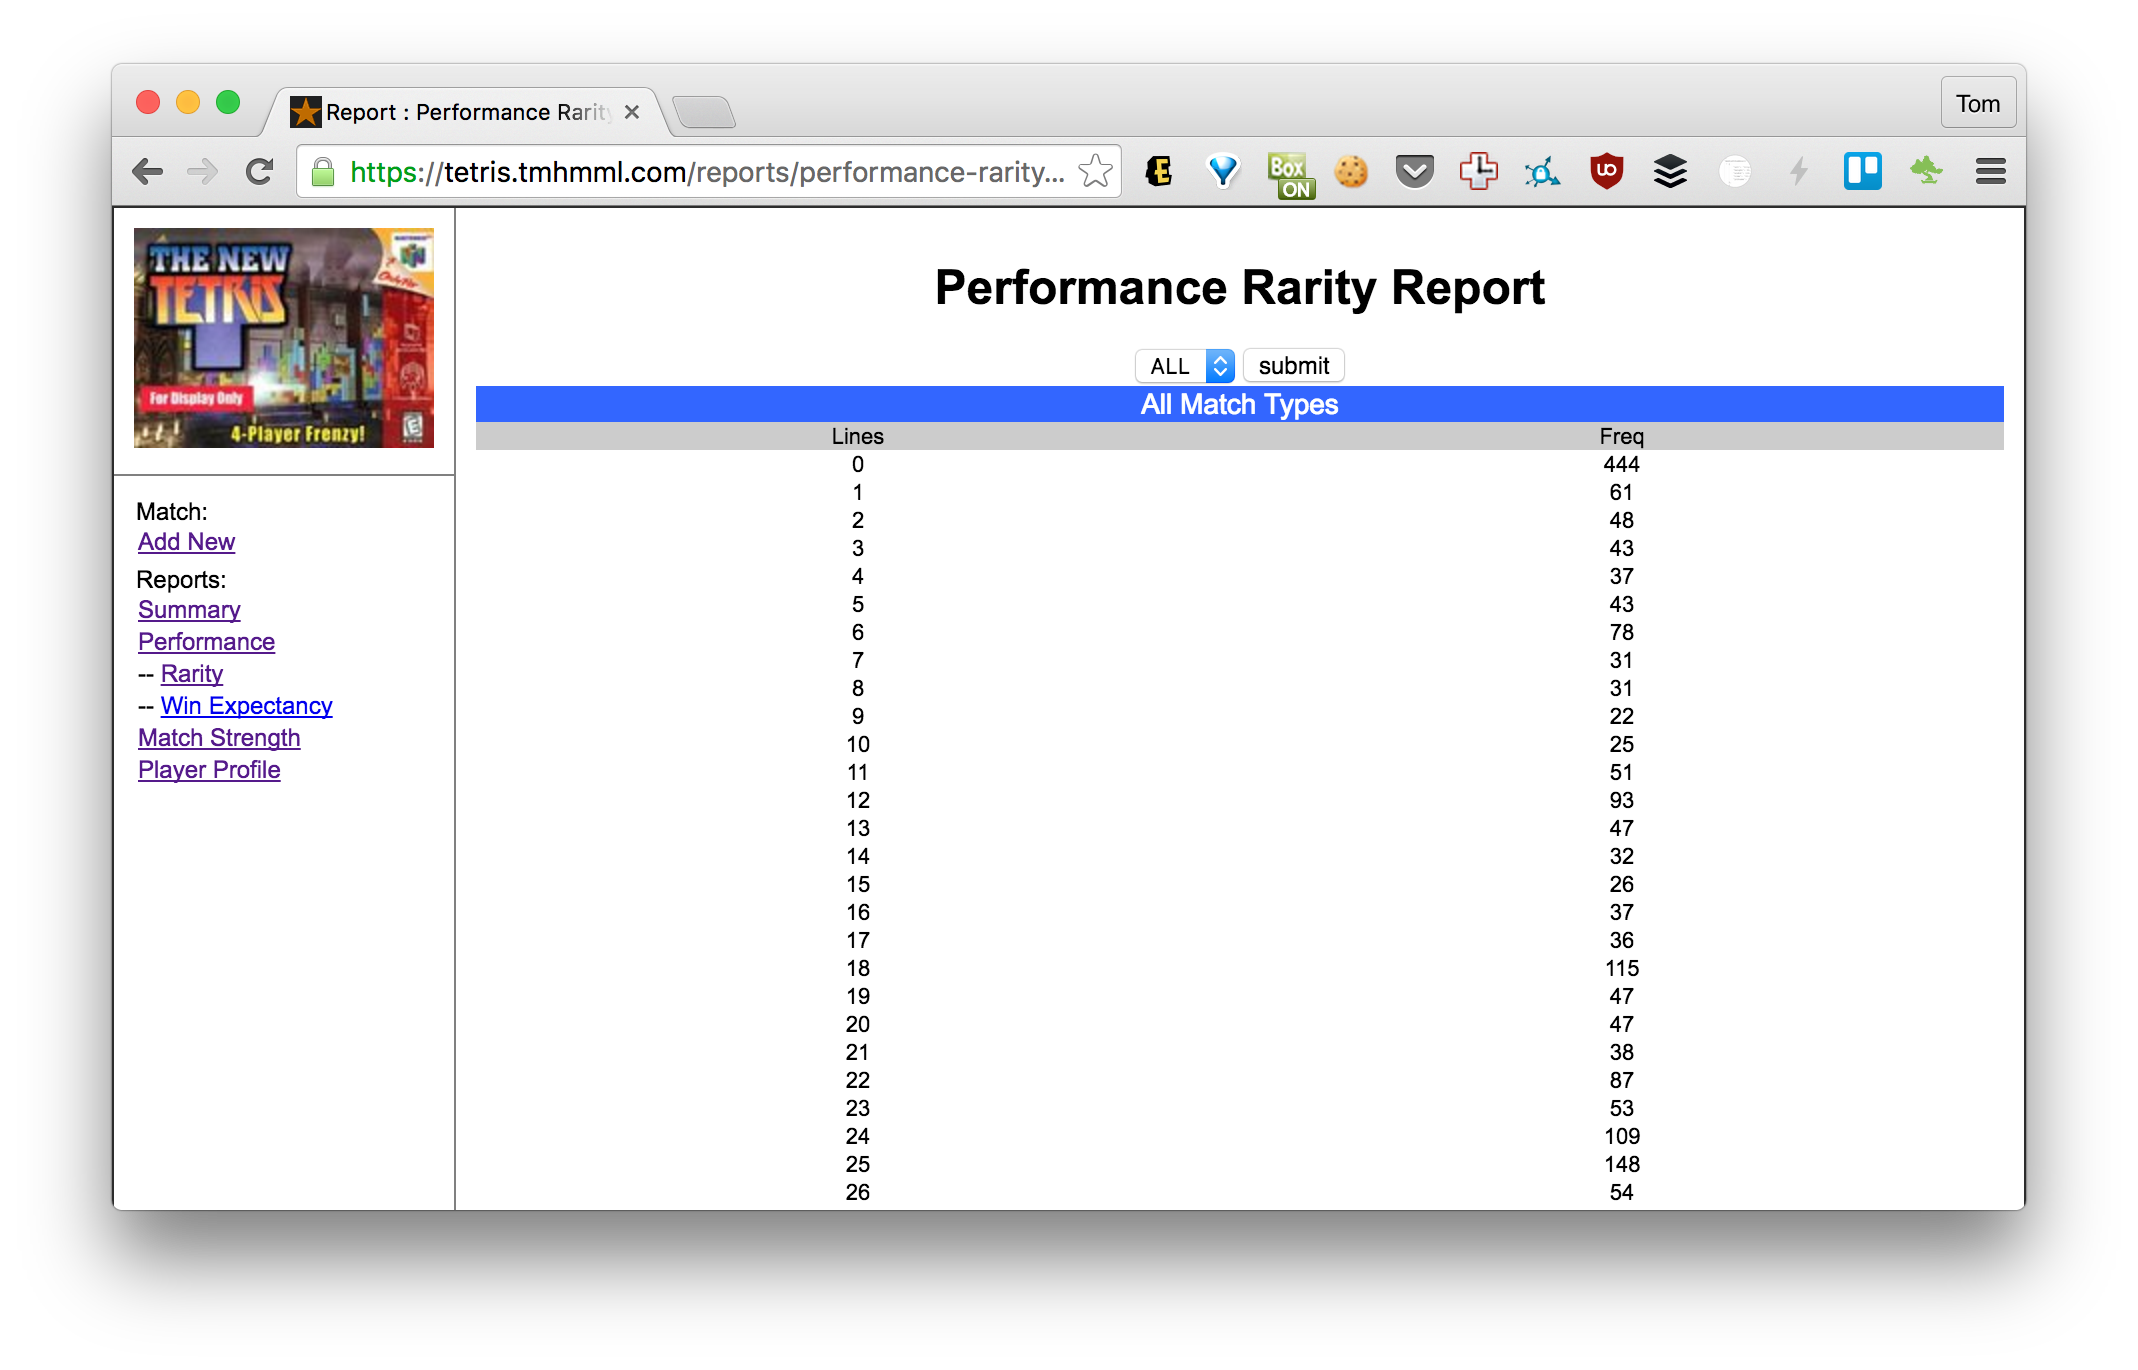 Performance Rarity Report